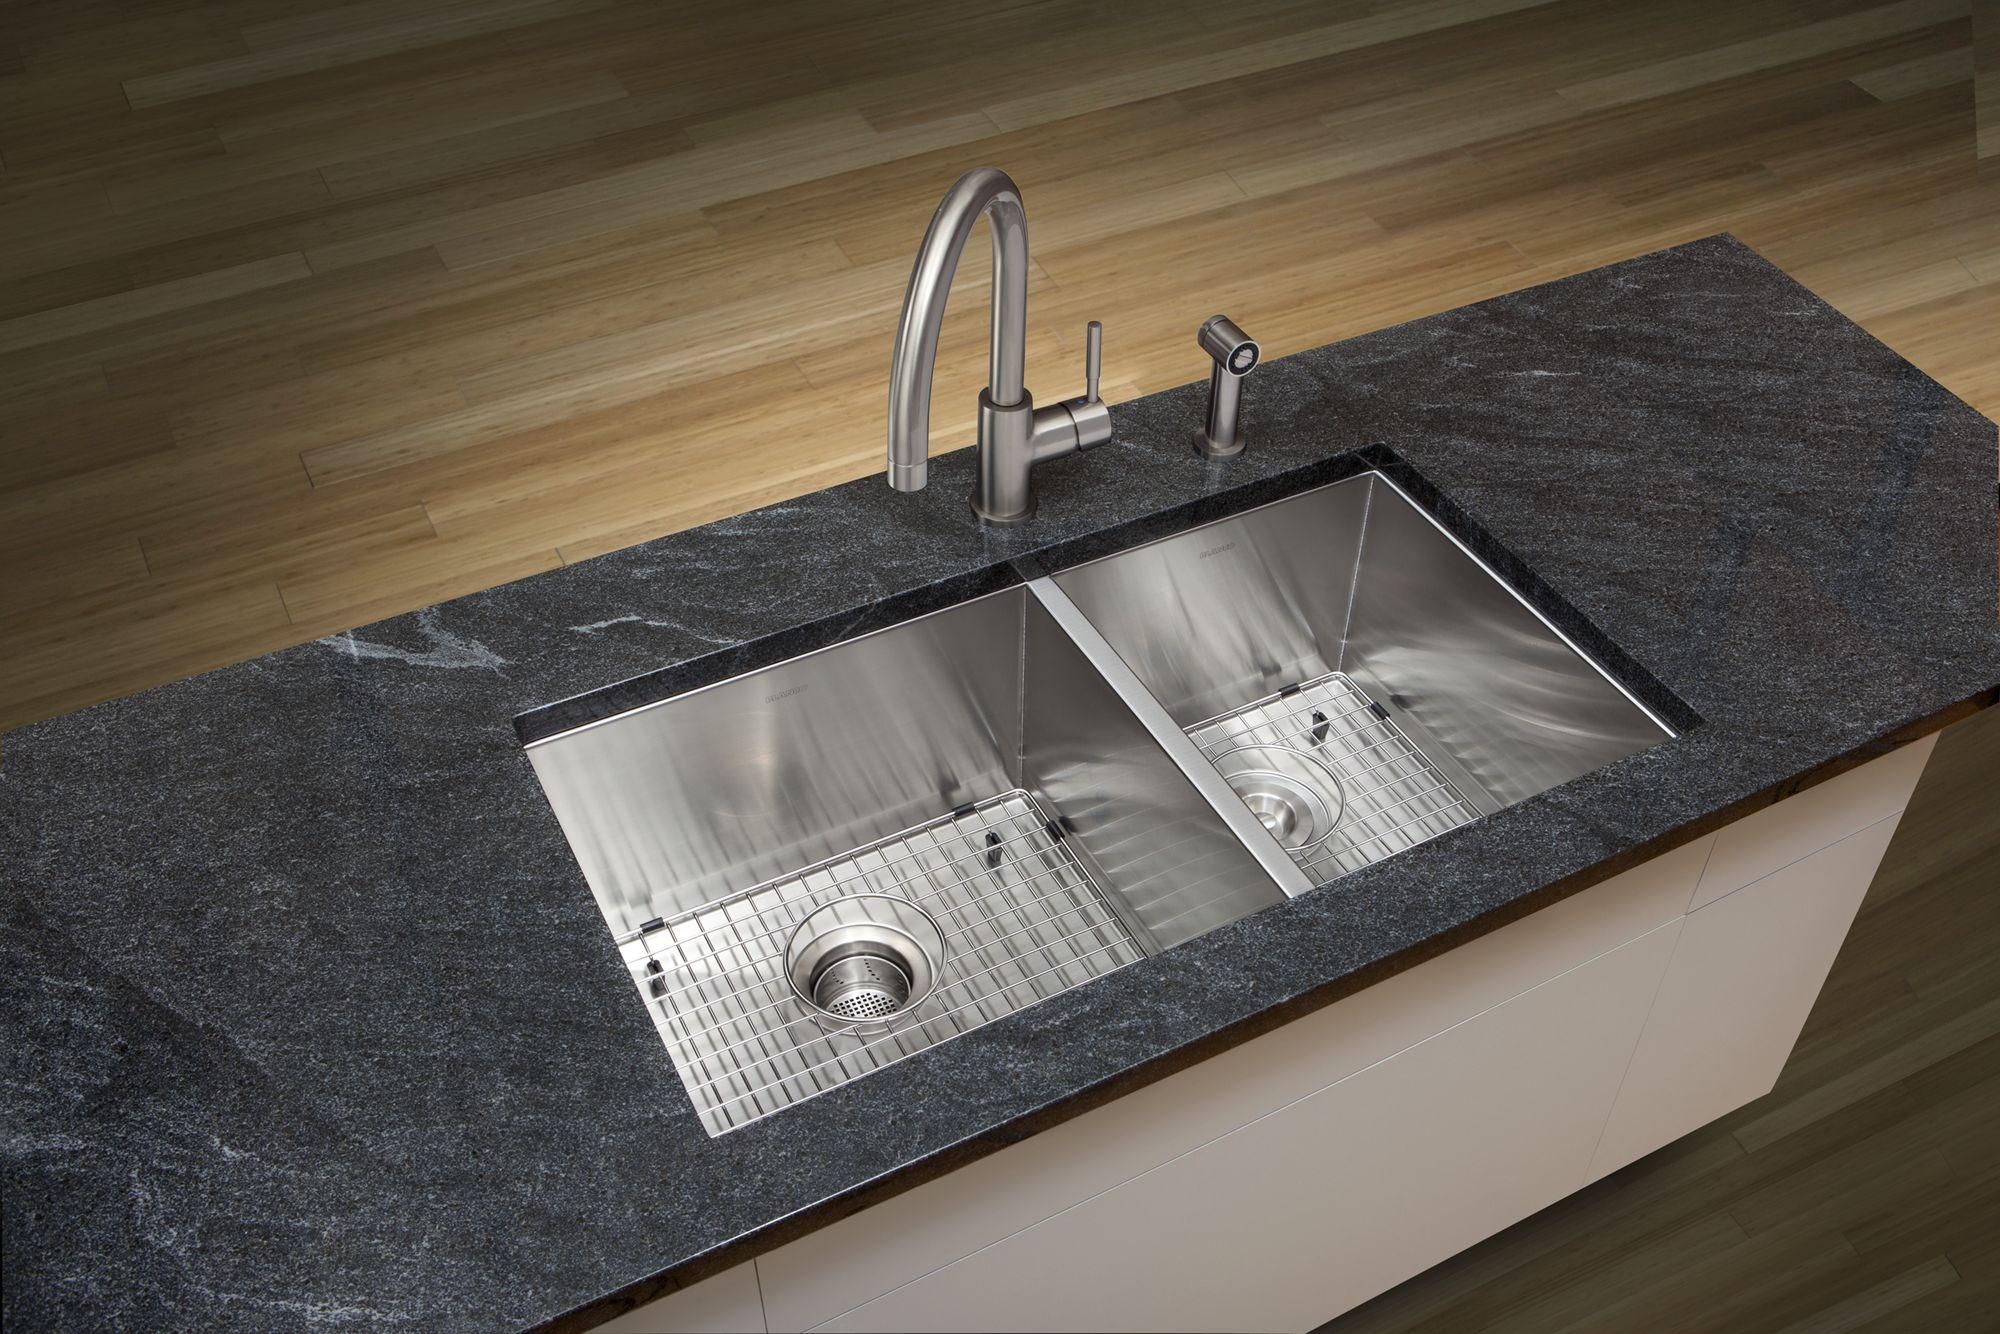 Blanco Granite Kitchen Sinks Blanco 518169 Satin Quatrus Kitchen Sink Undermount Double Basin